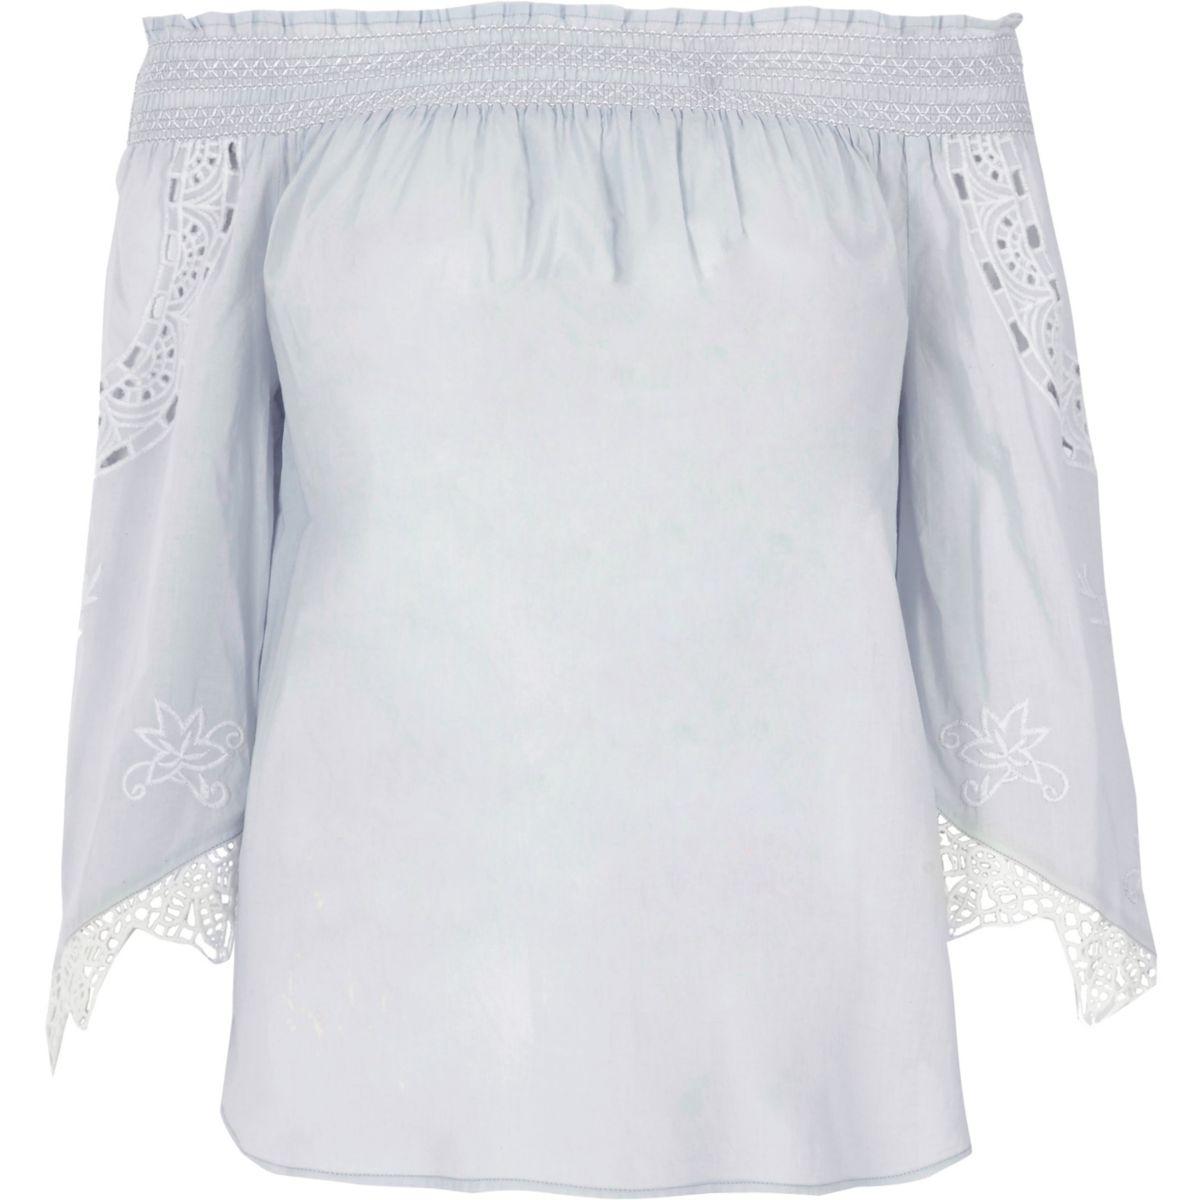 Light blue lace sleeve bardot top